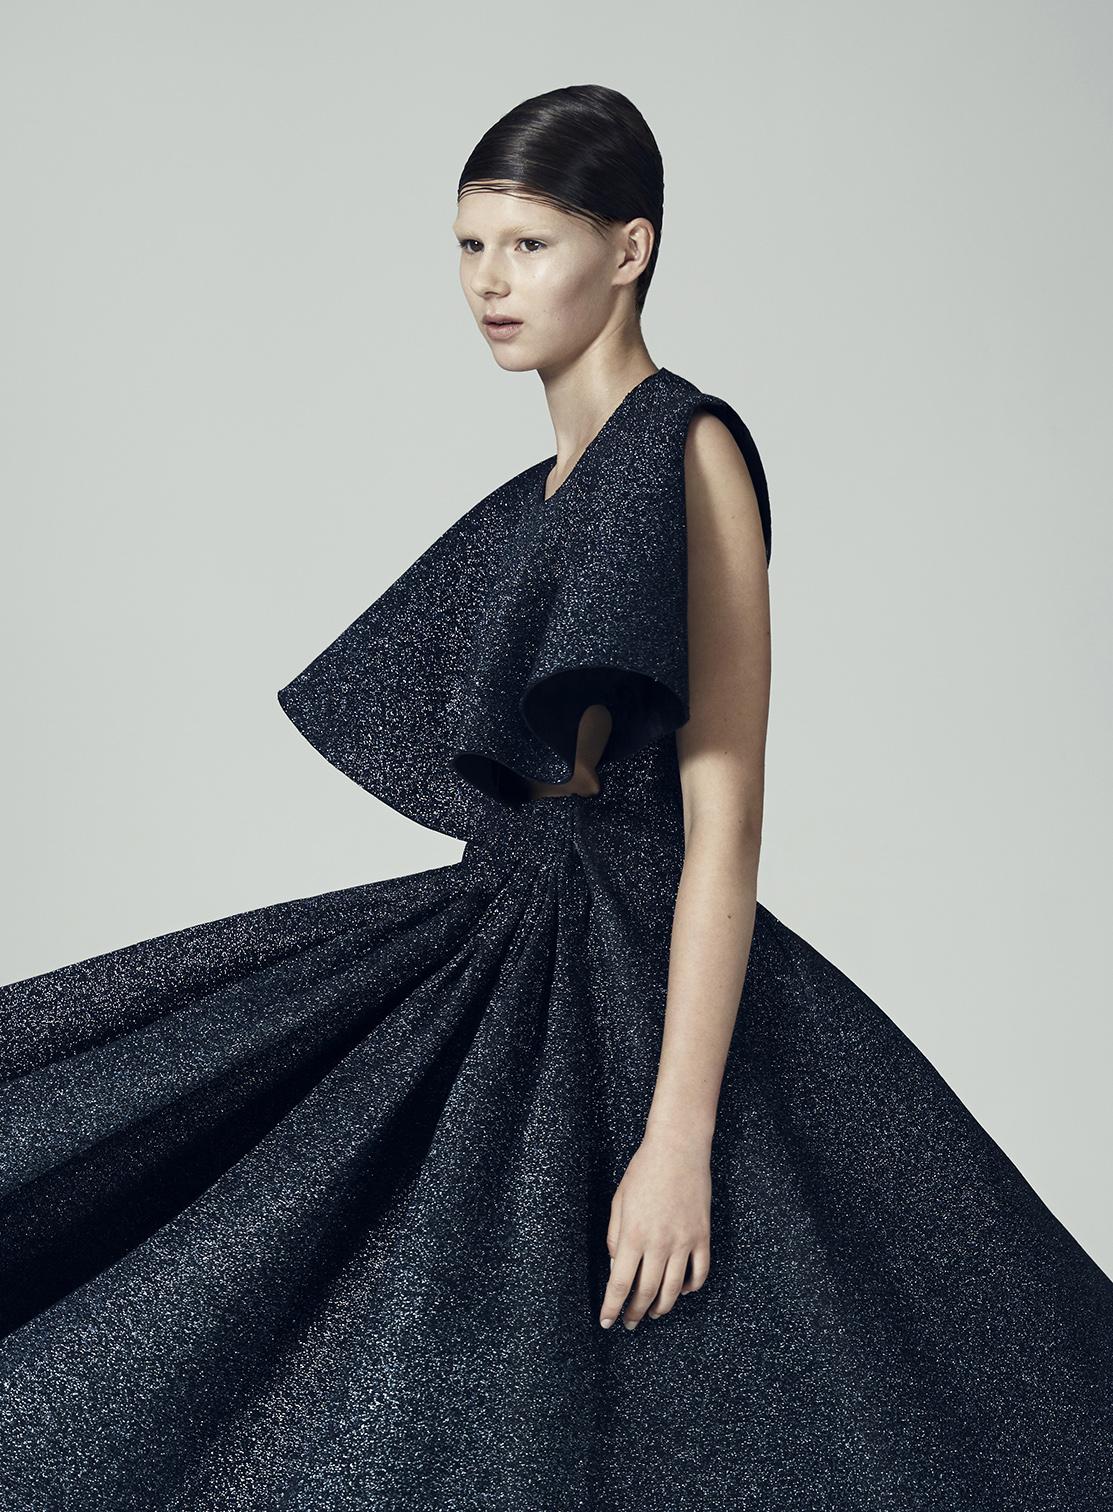 Matilda Norberg | Sculptural Knitwear Design